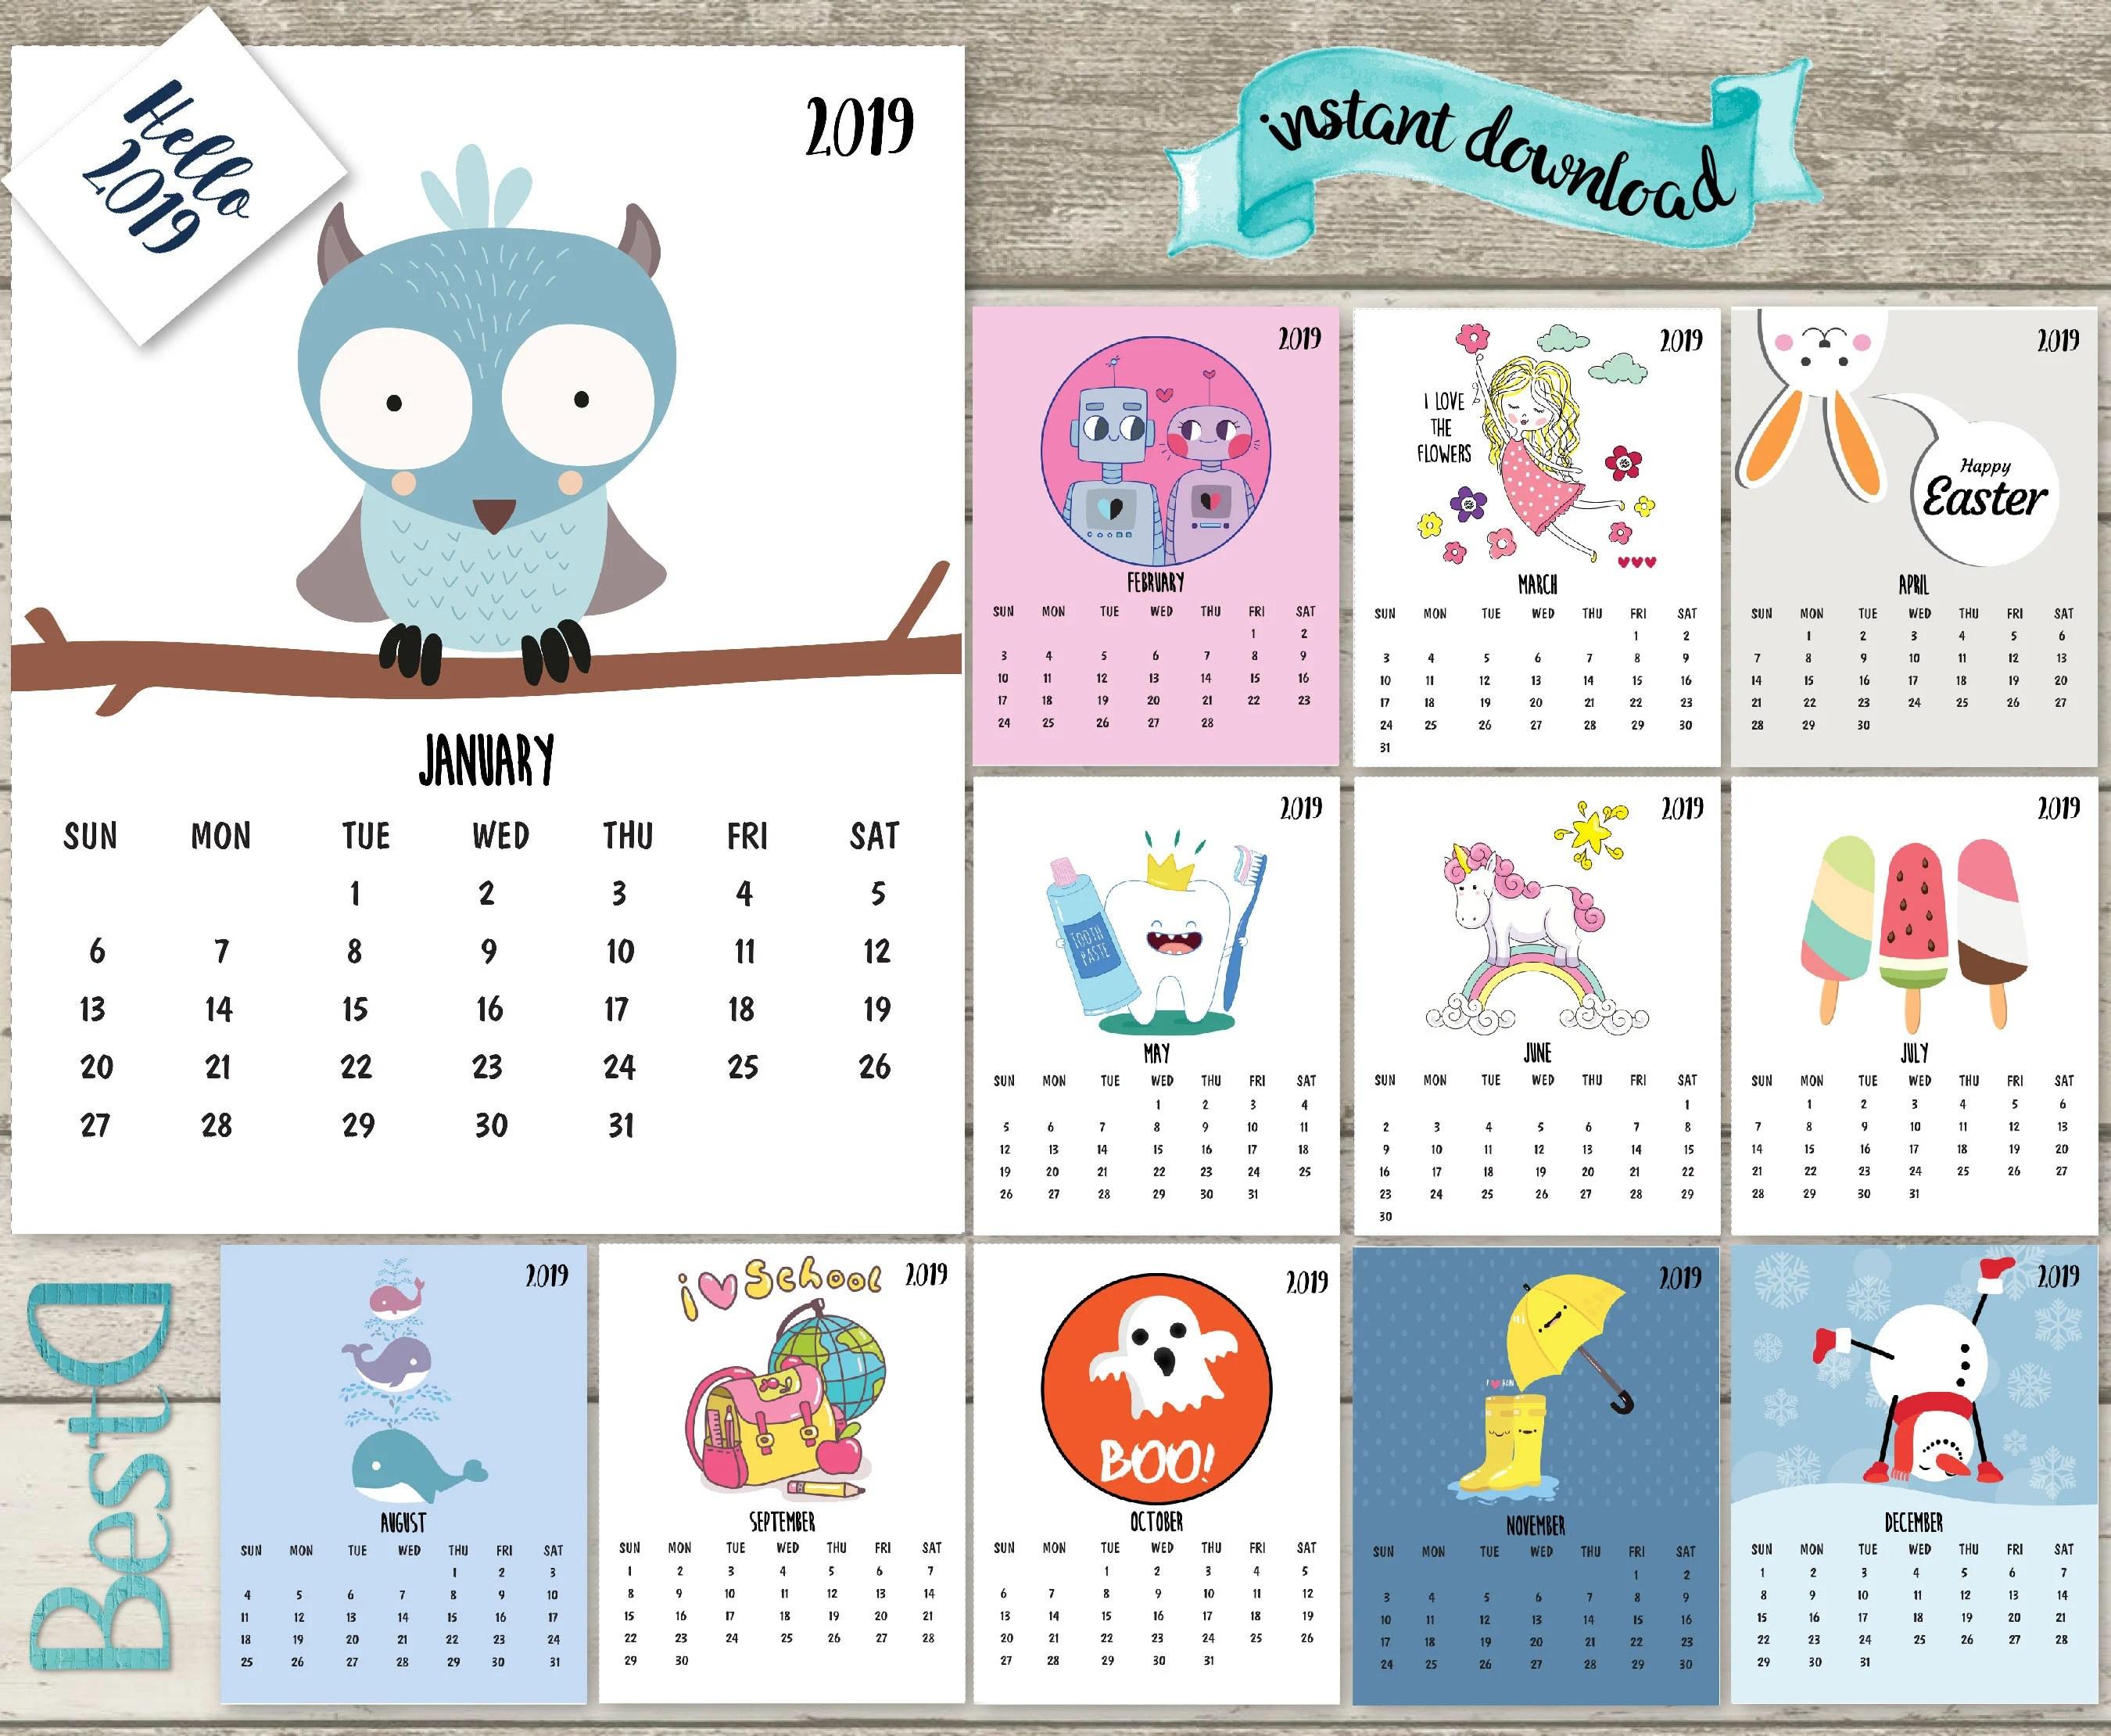 2019 2018 Kids Calendar2019 Funny Printable Calendar13